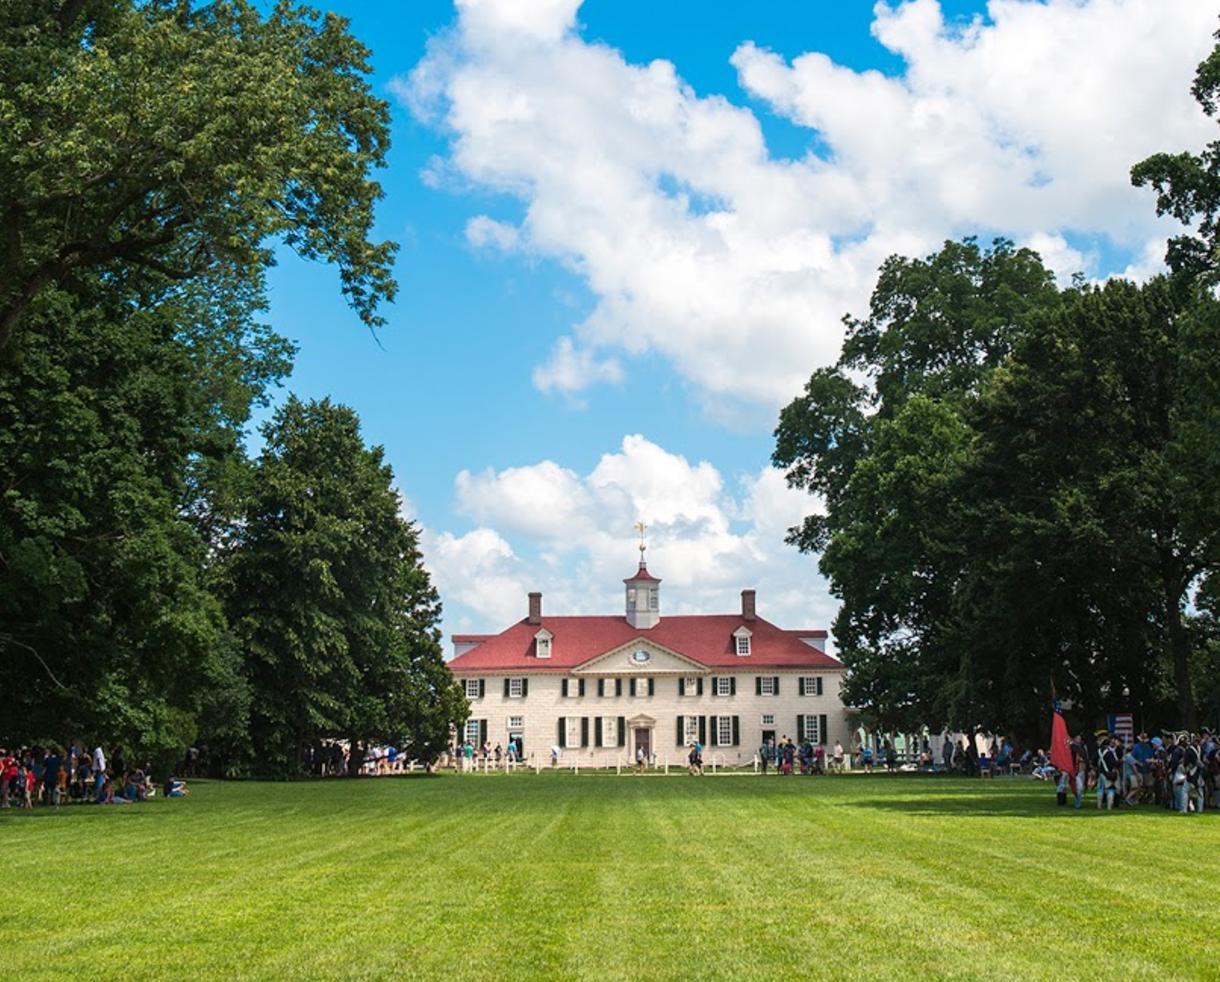 40% Off Admission at George Washington's Mount Vernon